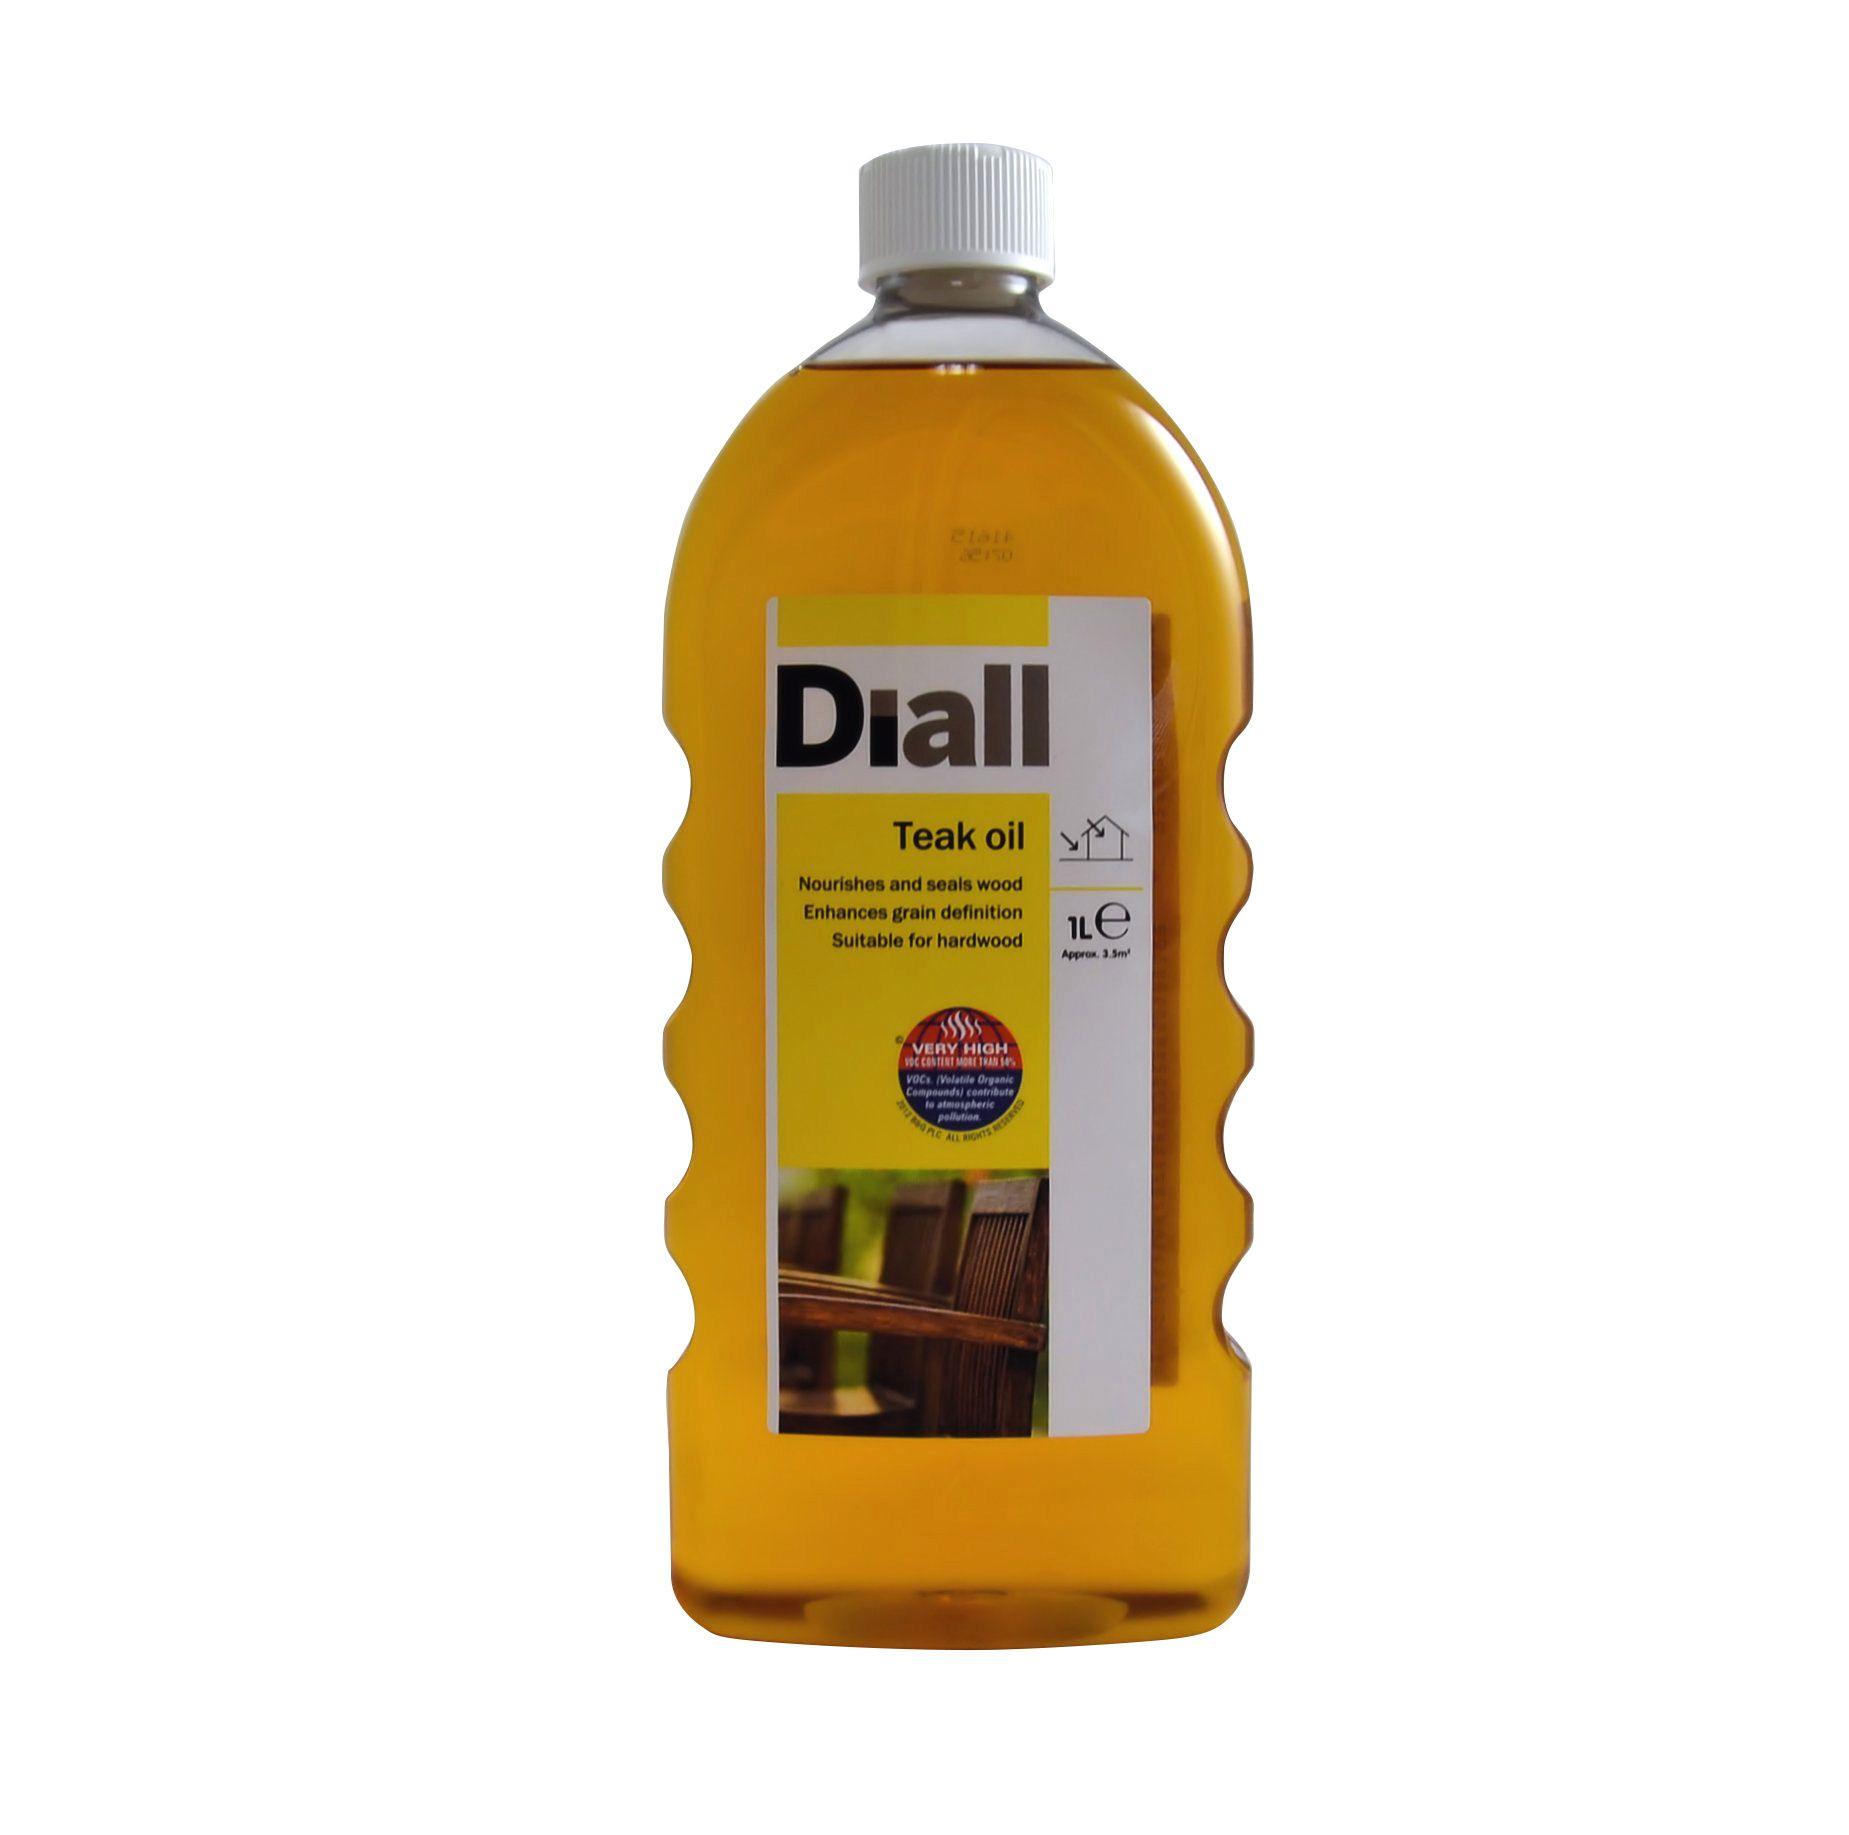 Diall Teak Oil 1l Departments Diy At B Amp Q